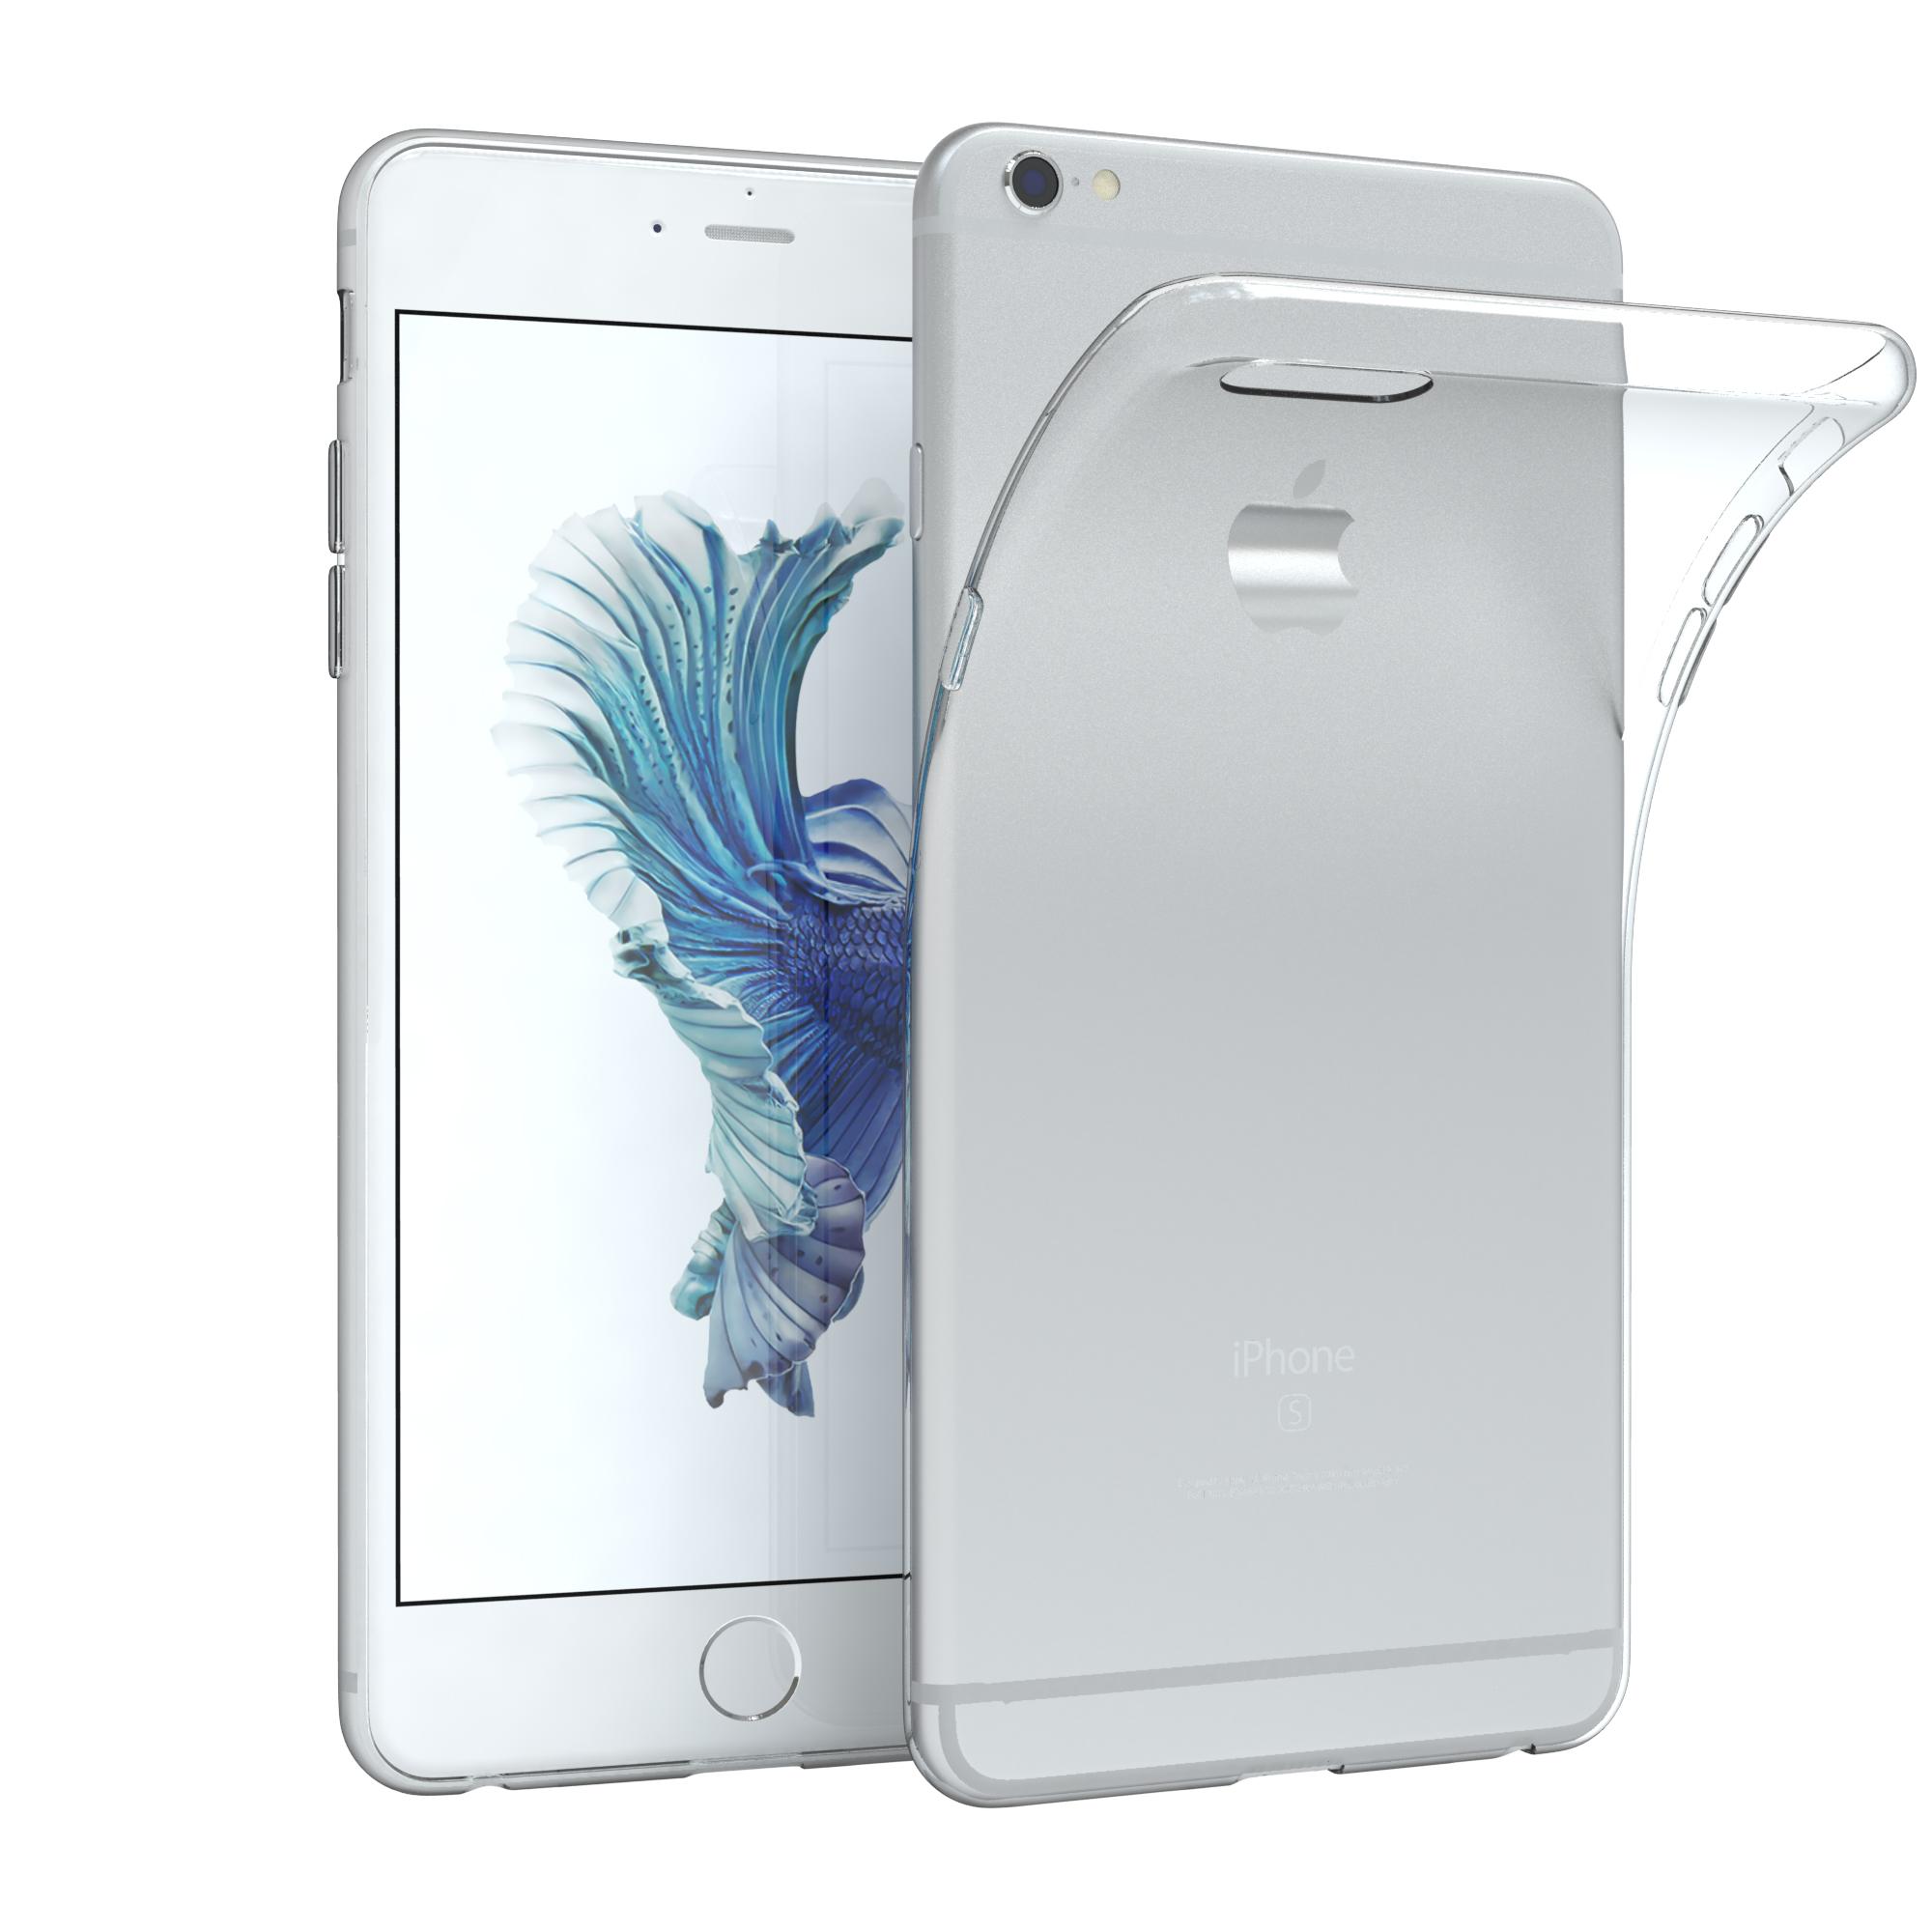 handyh lle f r iphone 6 plus iphone 6s plus slimcover d nn transparent r ckseite ebay. Black Bedroom Furniture Sets. Home Design Ideas